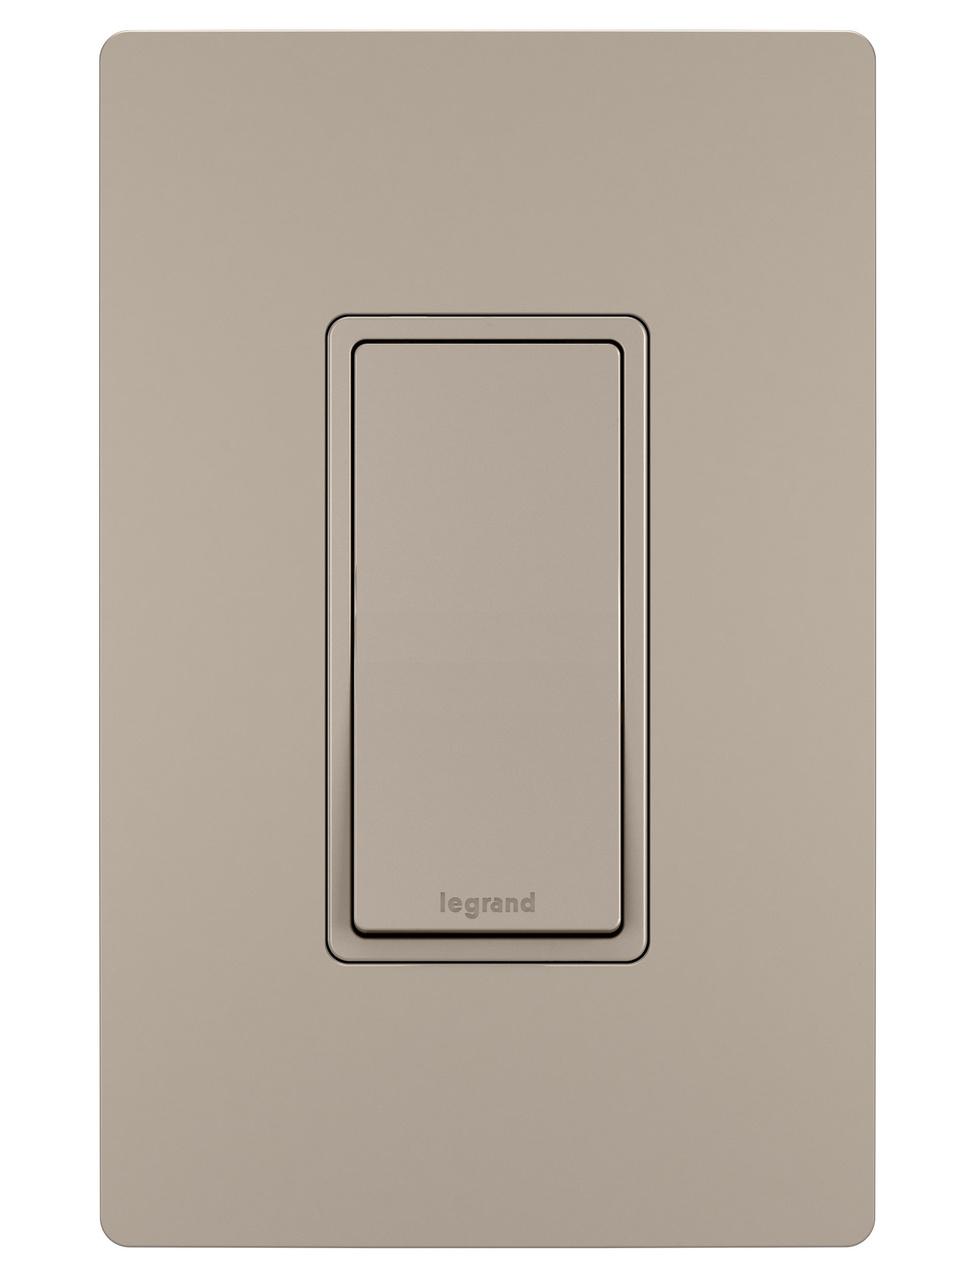 AET CPCINTWH Polished Chrome Classical Intermediate White Insert Plastic Rocker Switch-10 Amp Single 1 Gang Light Switch